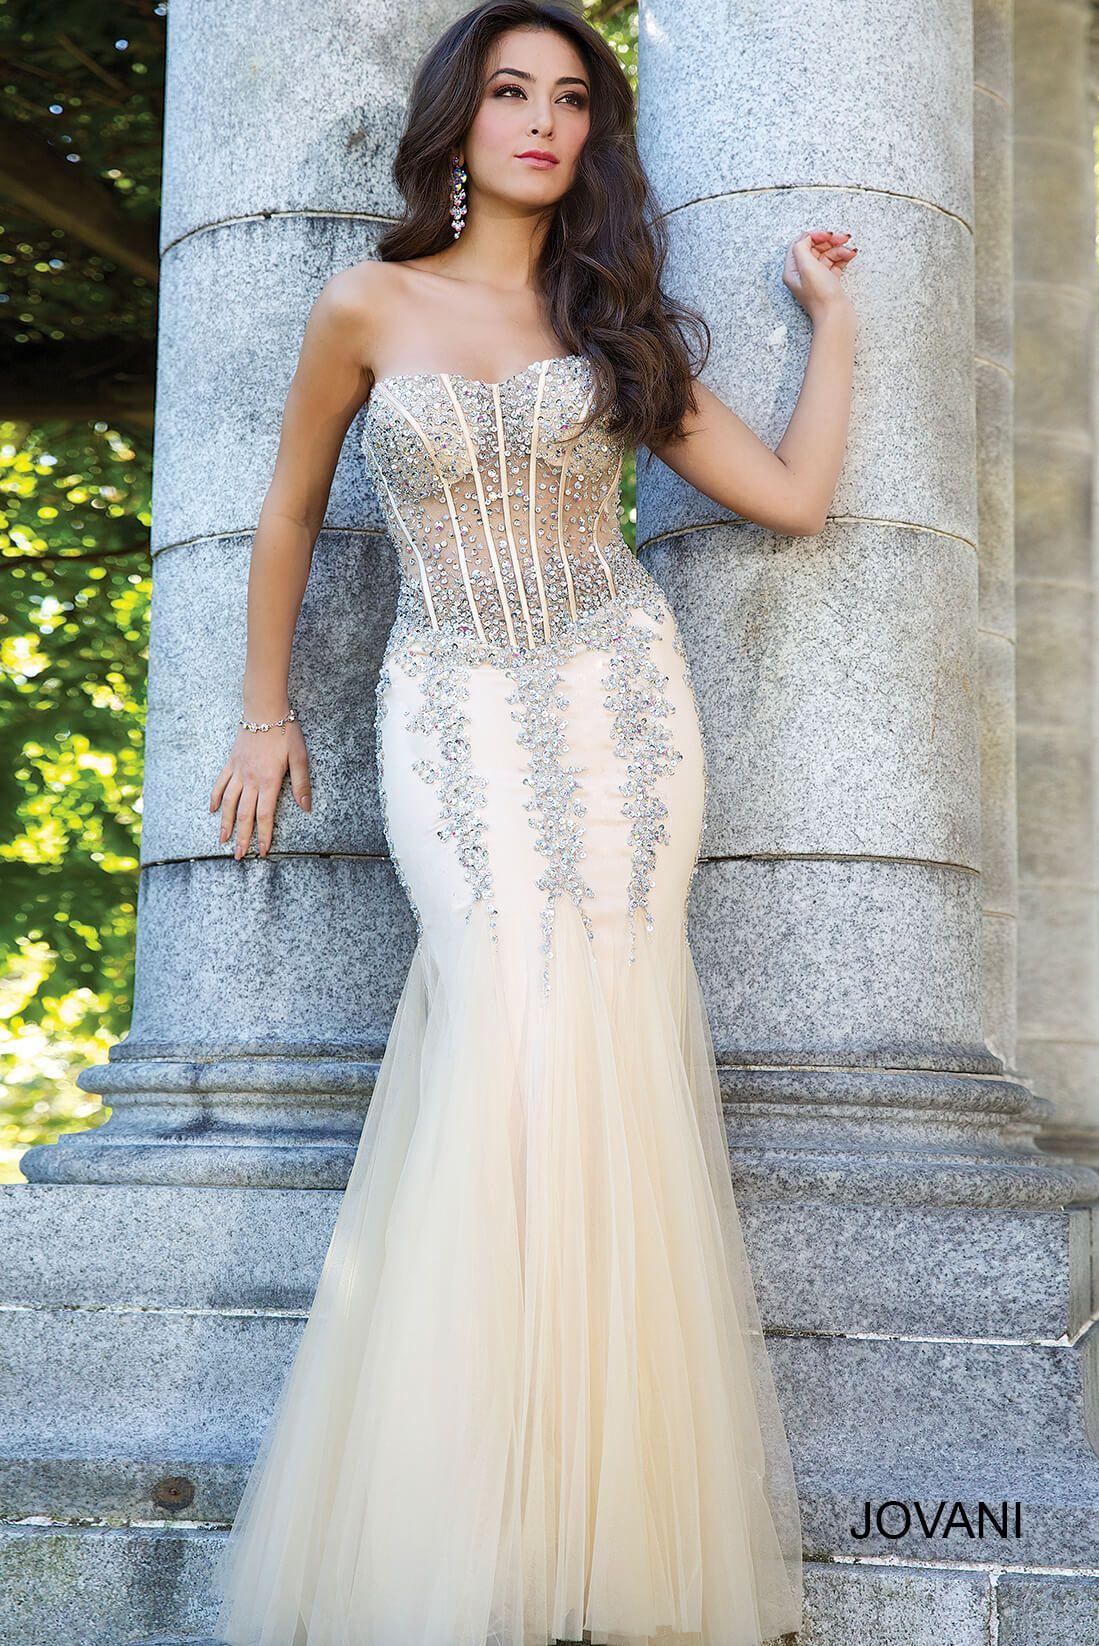 Sherri Hill 50843 - High Neck Halter Ball Gown Prom Dress